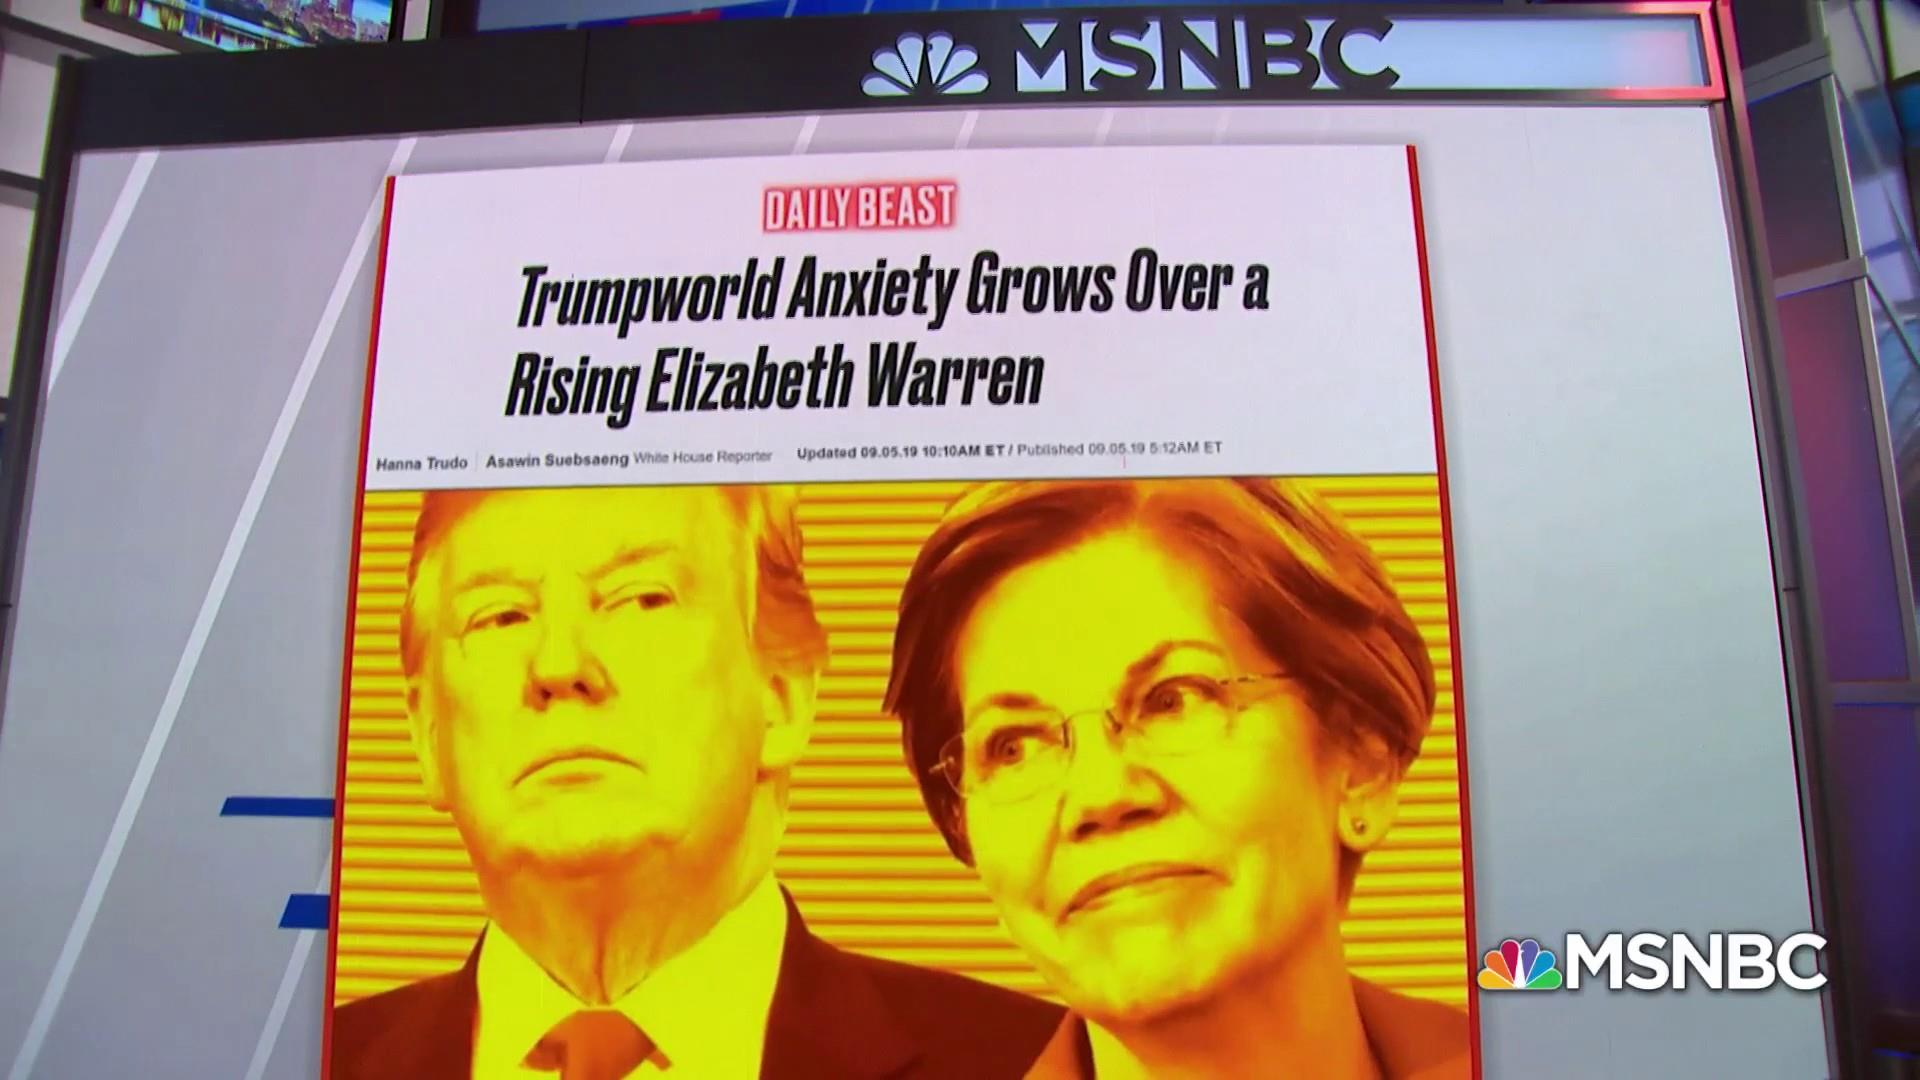 Daily Beast: Trumpworld anxiety grows over a rising Elizabeth Warren